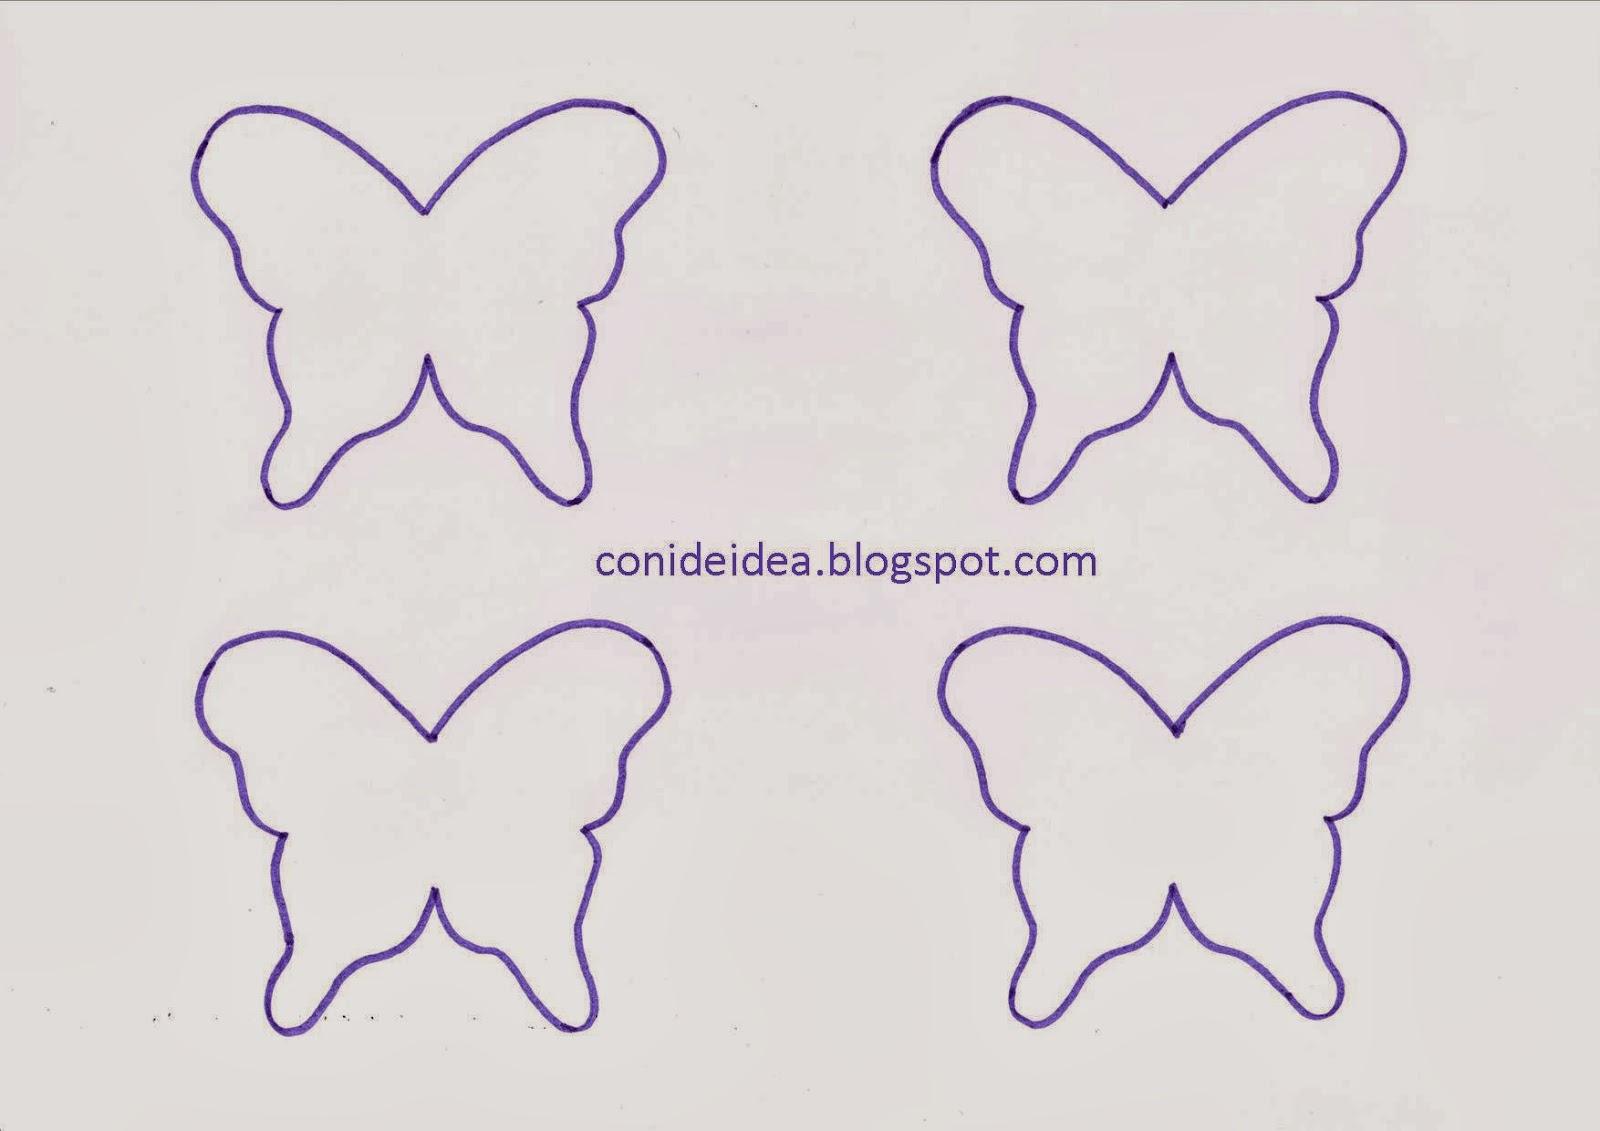 Perfecto Plantilla Para Colorear Mariposa Ornamento - Dibujos Para ...